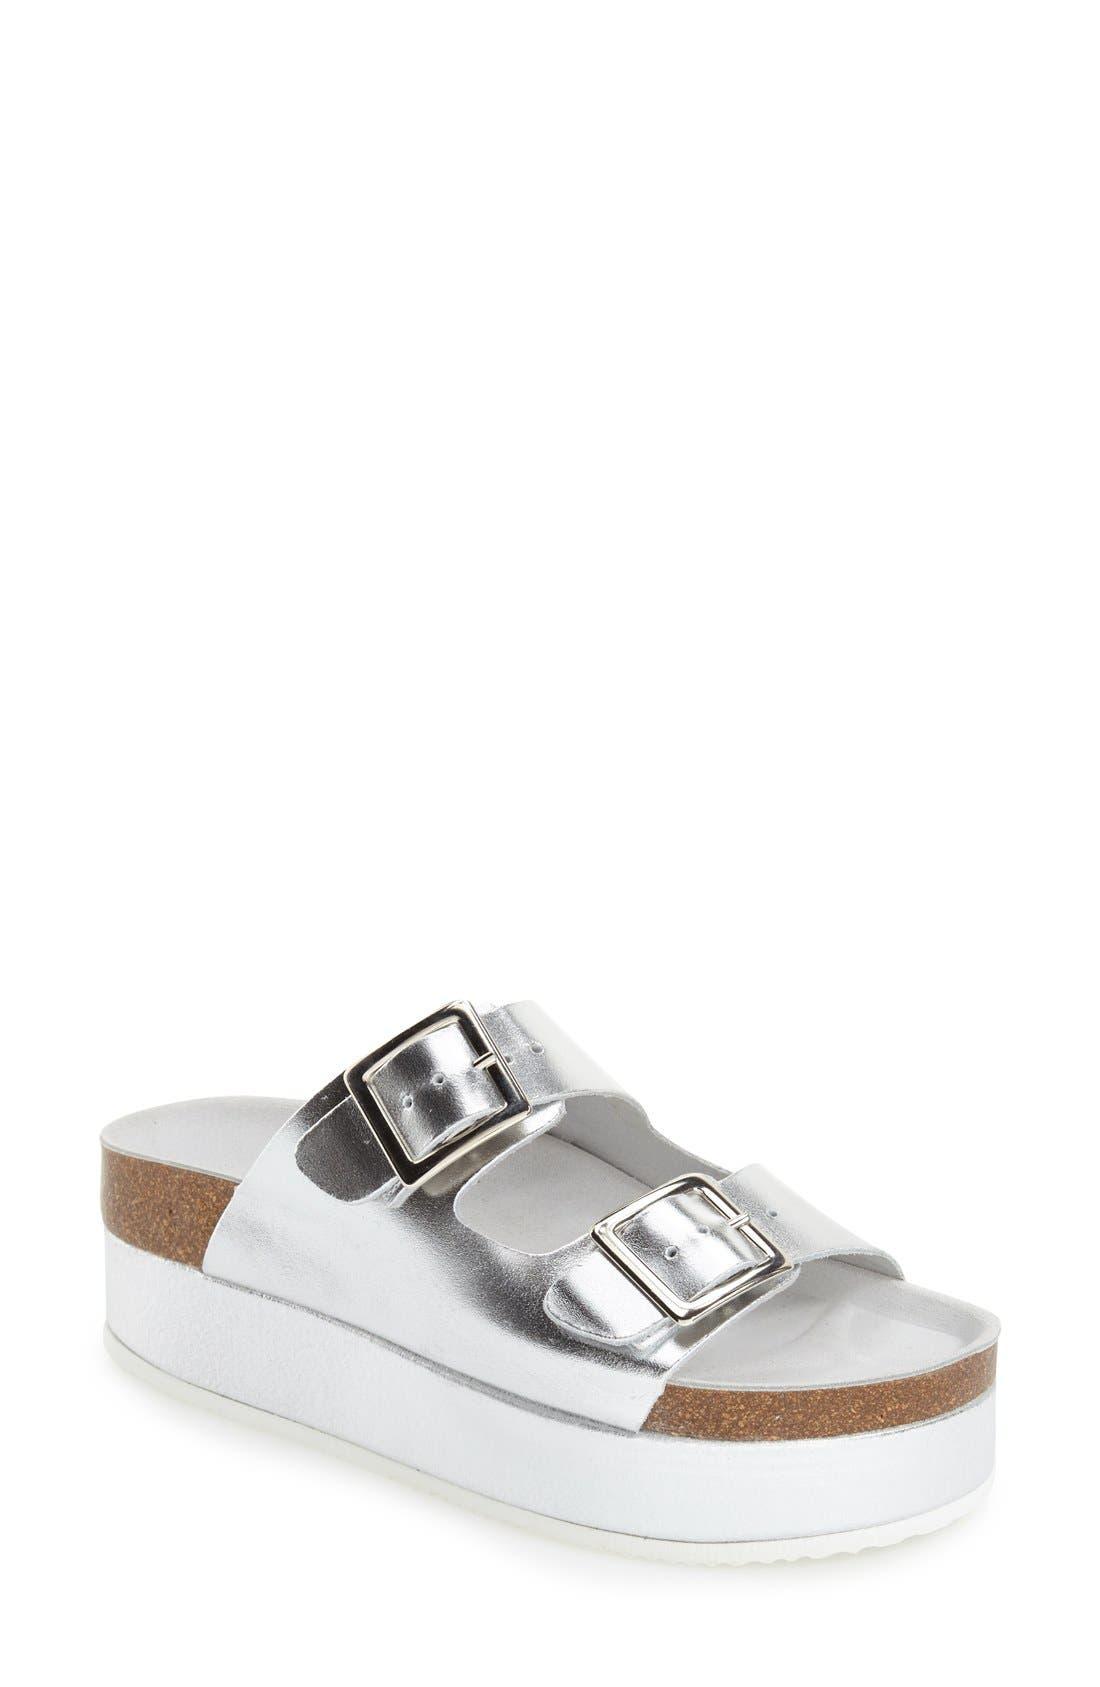 'Fang' Platform Sandal,                             Main thumbnail 1, color,                             Silver Multi